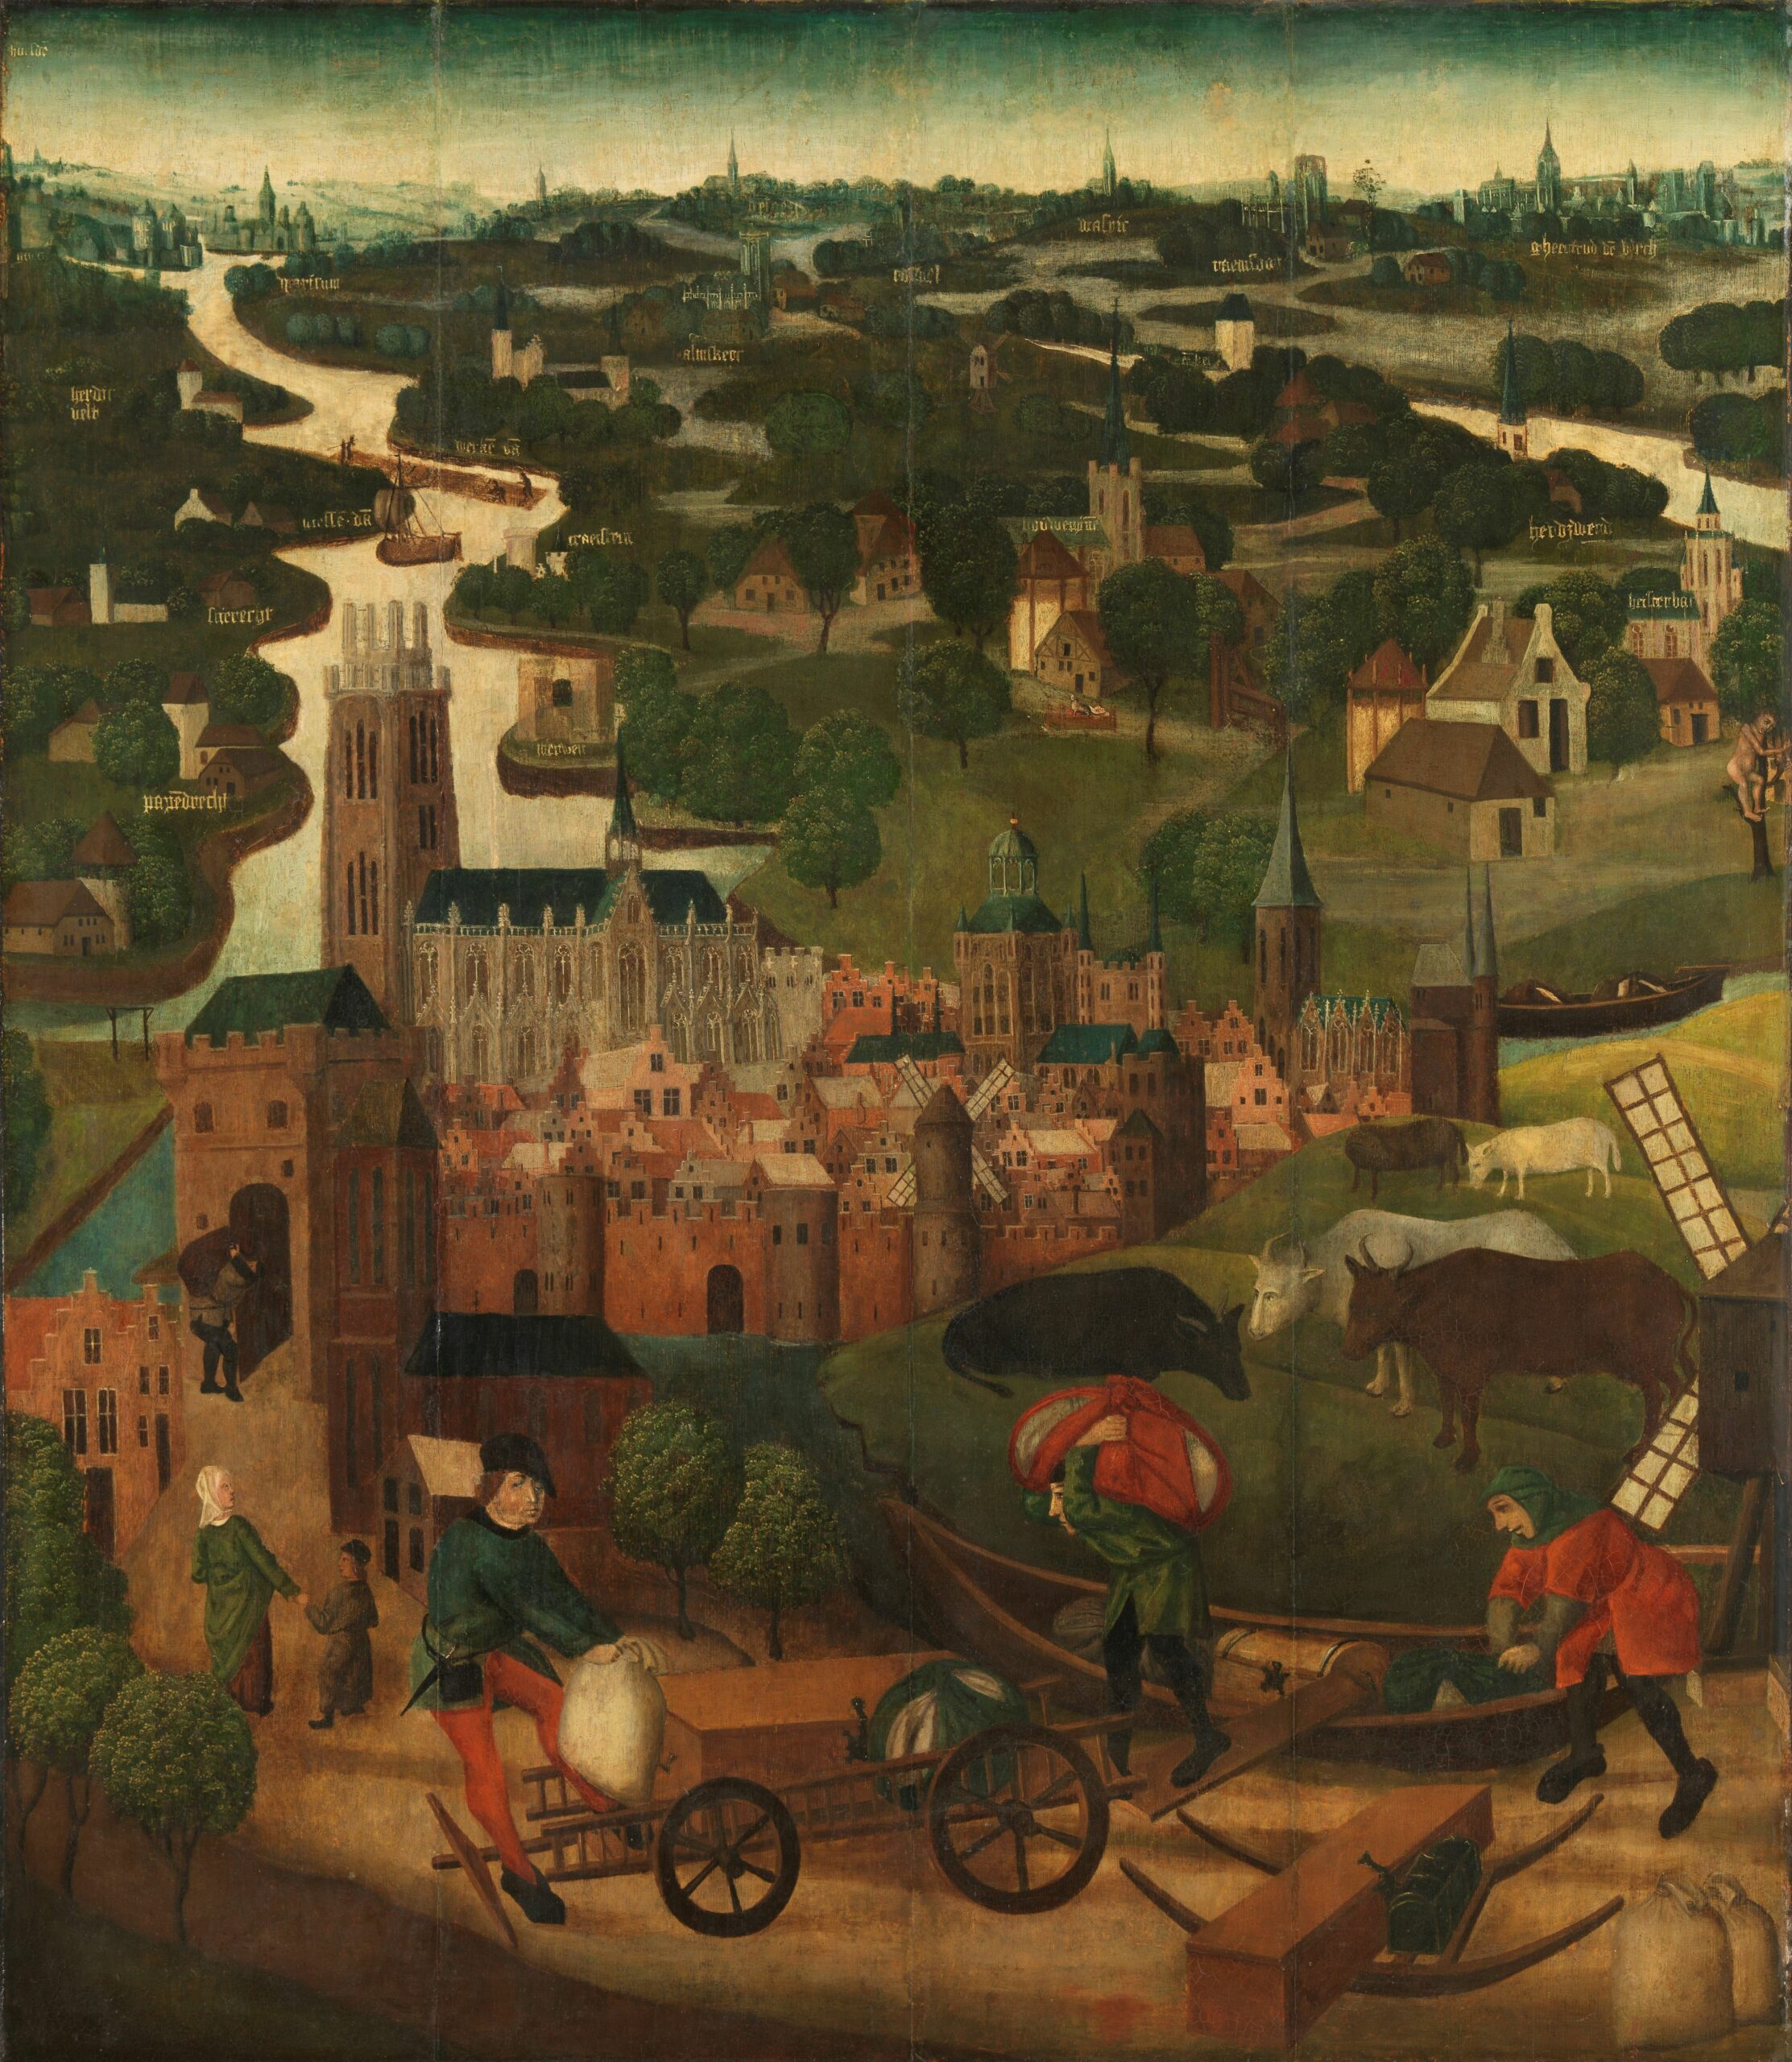 Rijksmuseum, The Saint Elizabeth's Day Flood (Panel A)